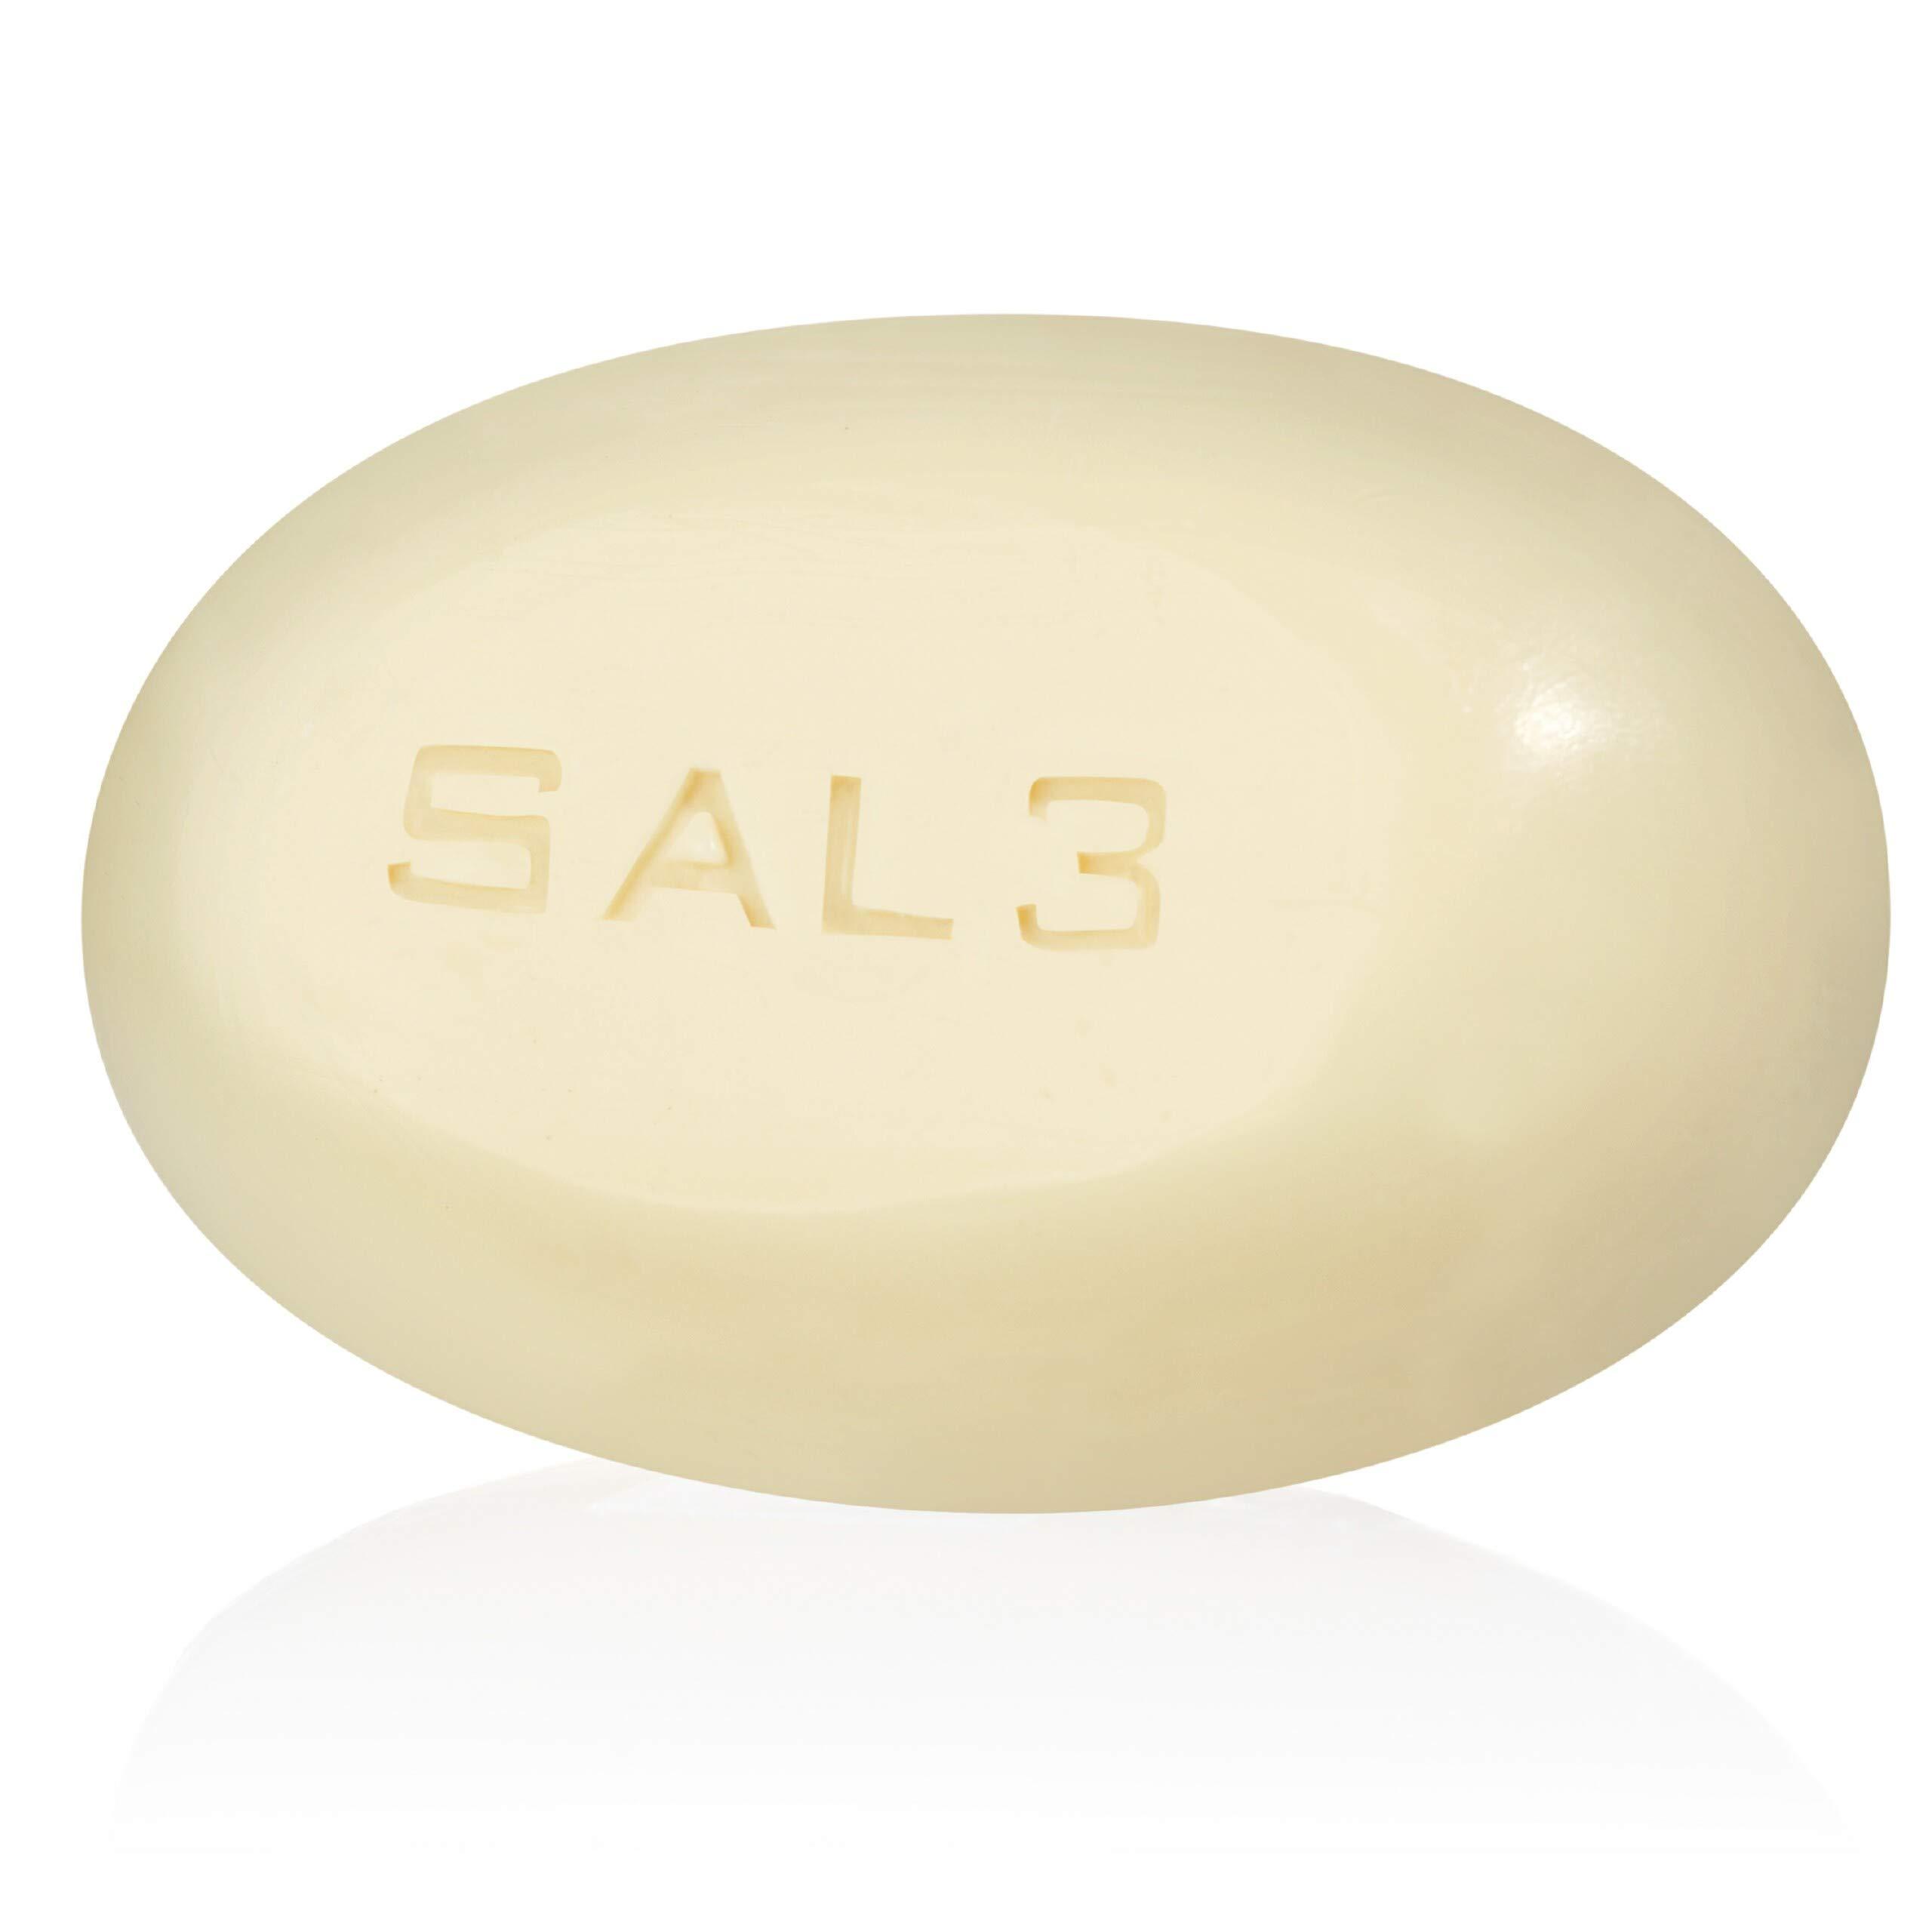 25 bar Dermatologist Pack - SAL3 Soap, 10% Sulfur, 3% Salicylic Acid by SAL3 (Image #2)